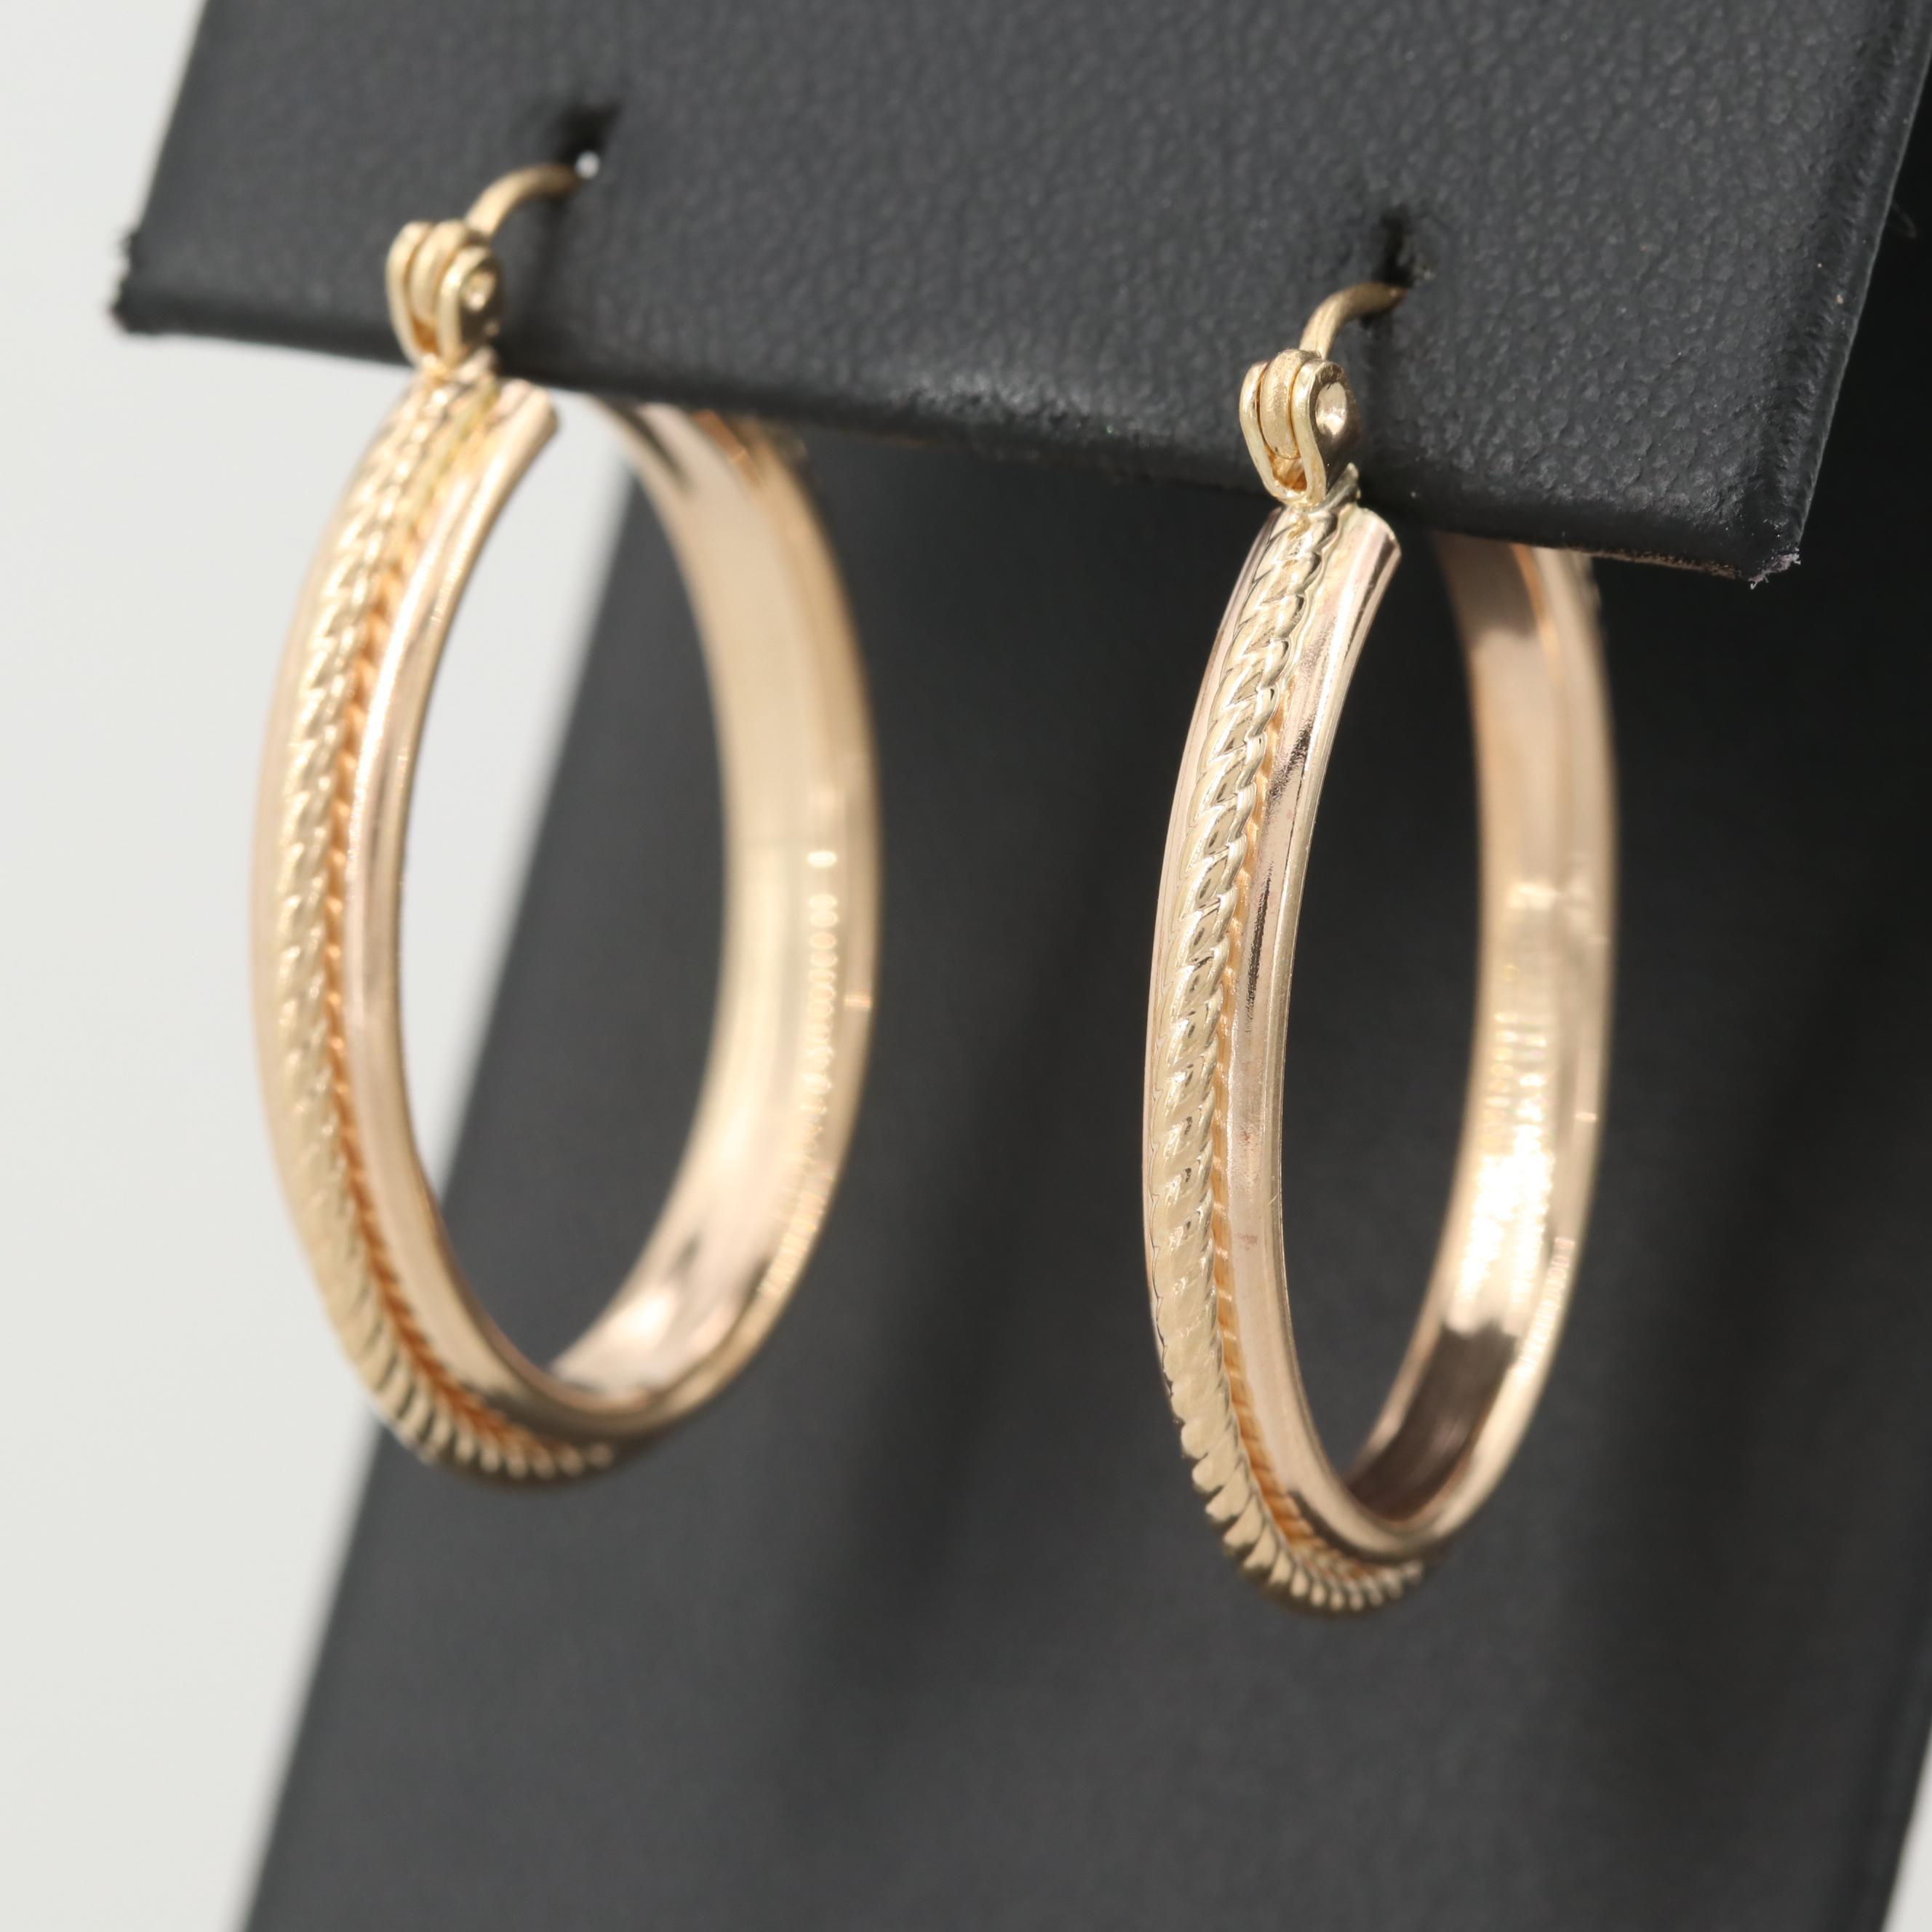 14K Yellow Gold Hoop Earrings with Rope Detail